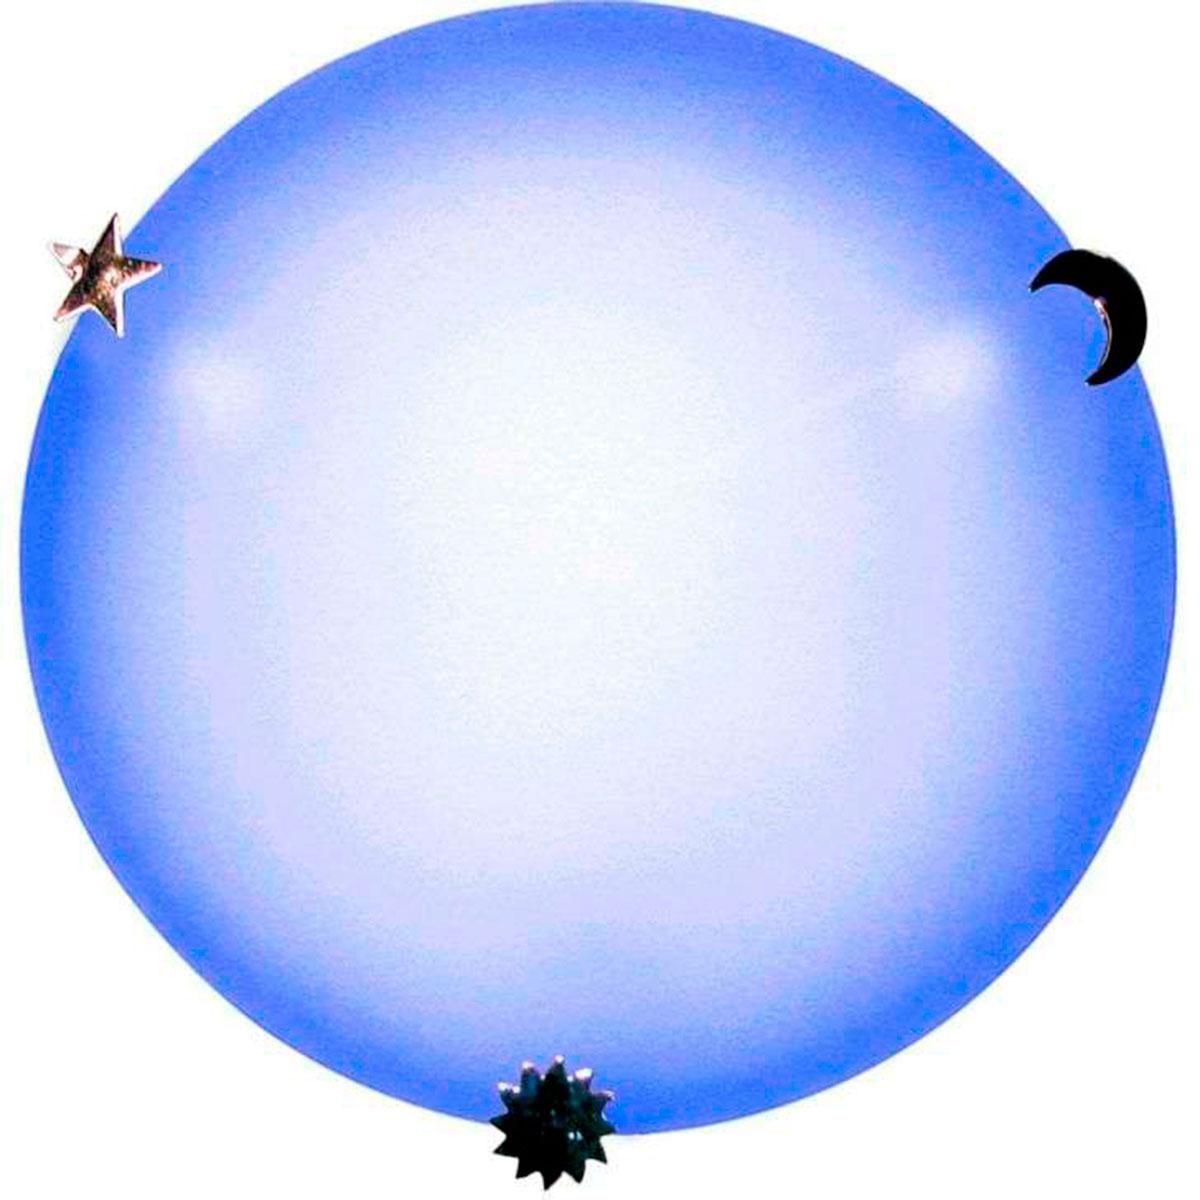 Plafon Colors 30cm 2 Lampadas E-27 Max 60w Vidro Azul